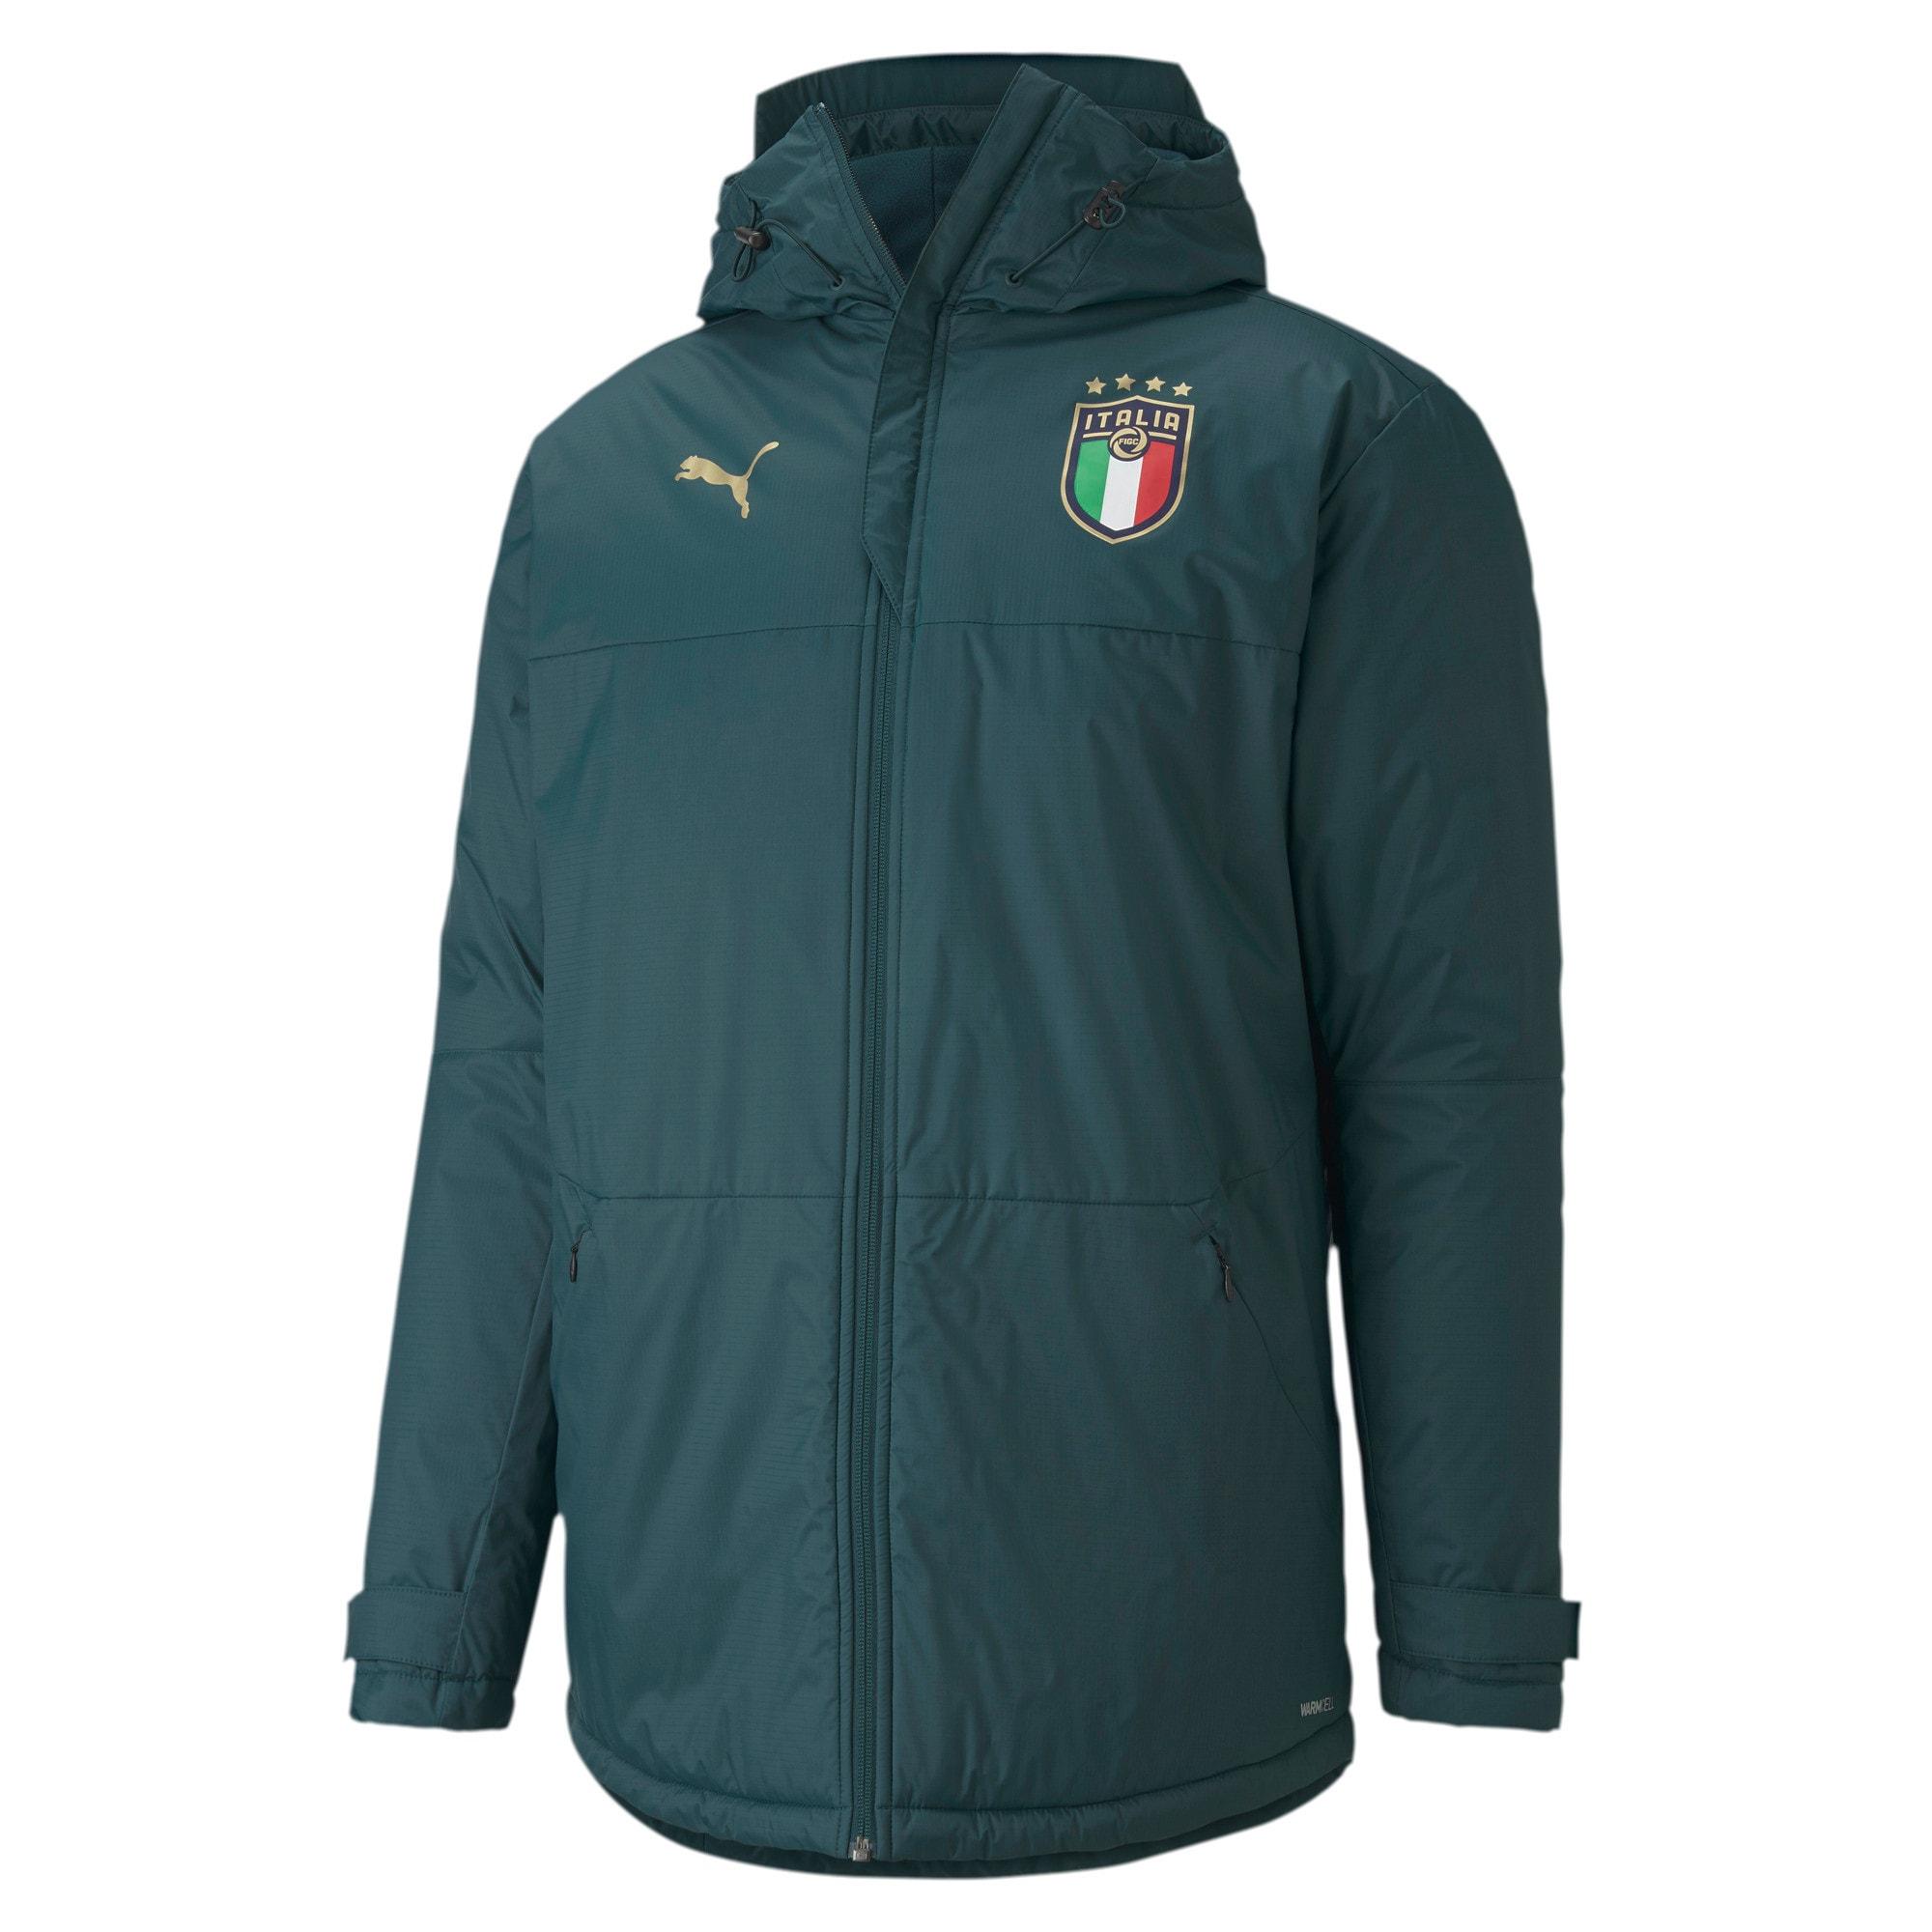 Thumbnail 1 of FIGC イタリア トレーニング ウィンター ジャケット, Ponderosa Pine-Peacoat, medium-JPN